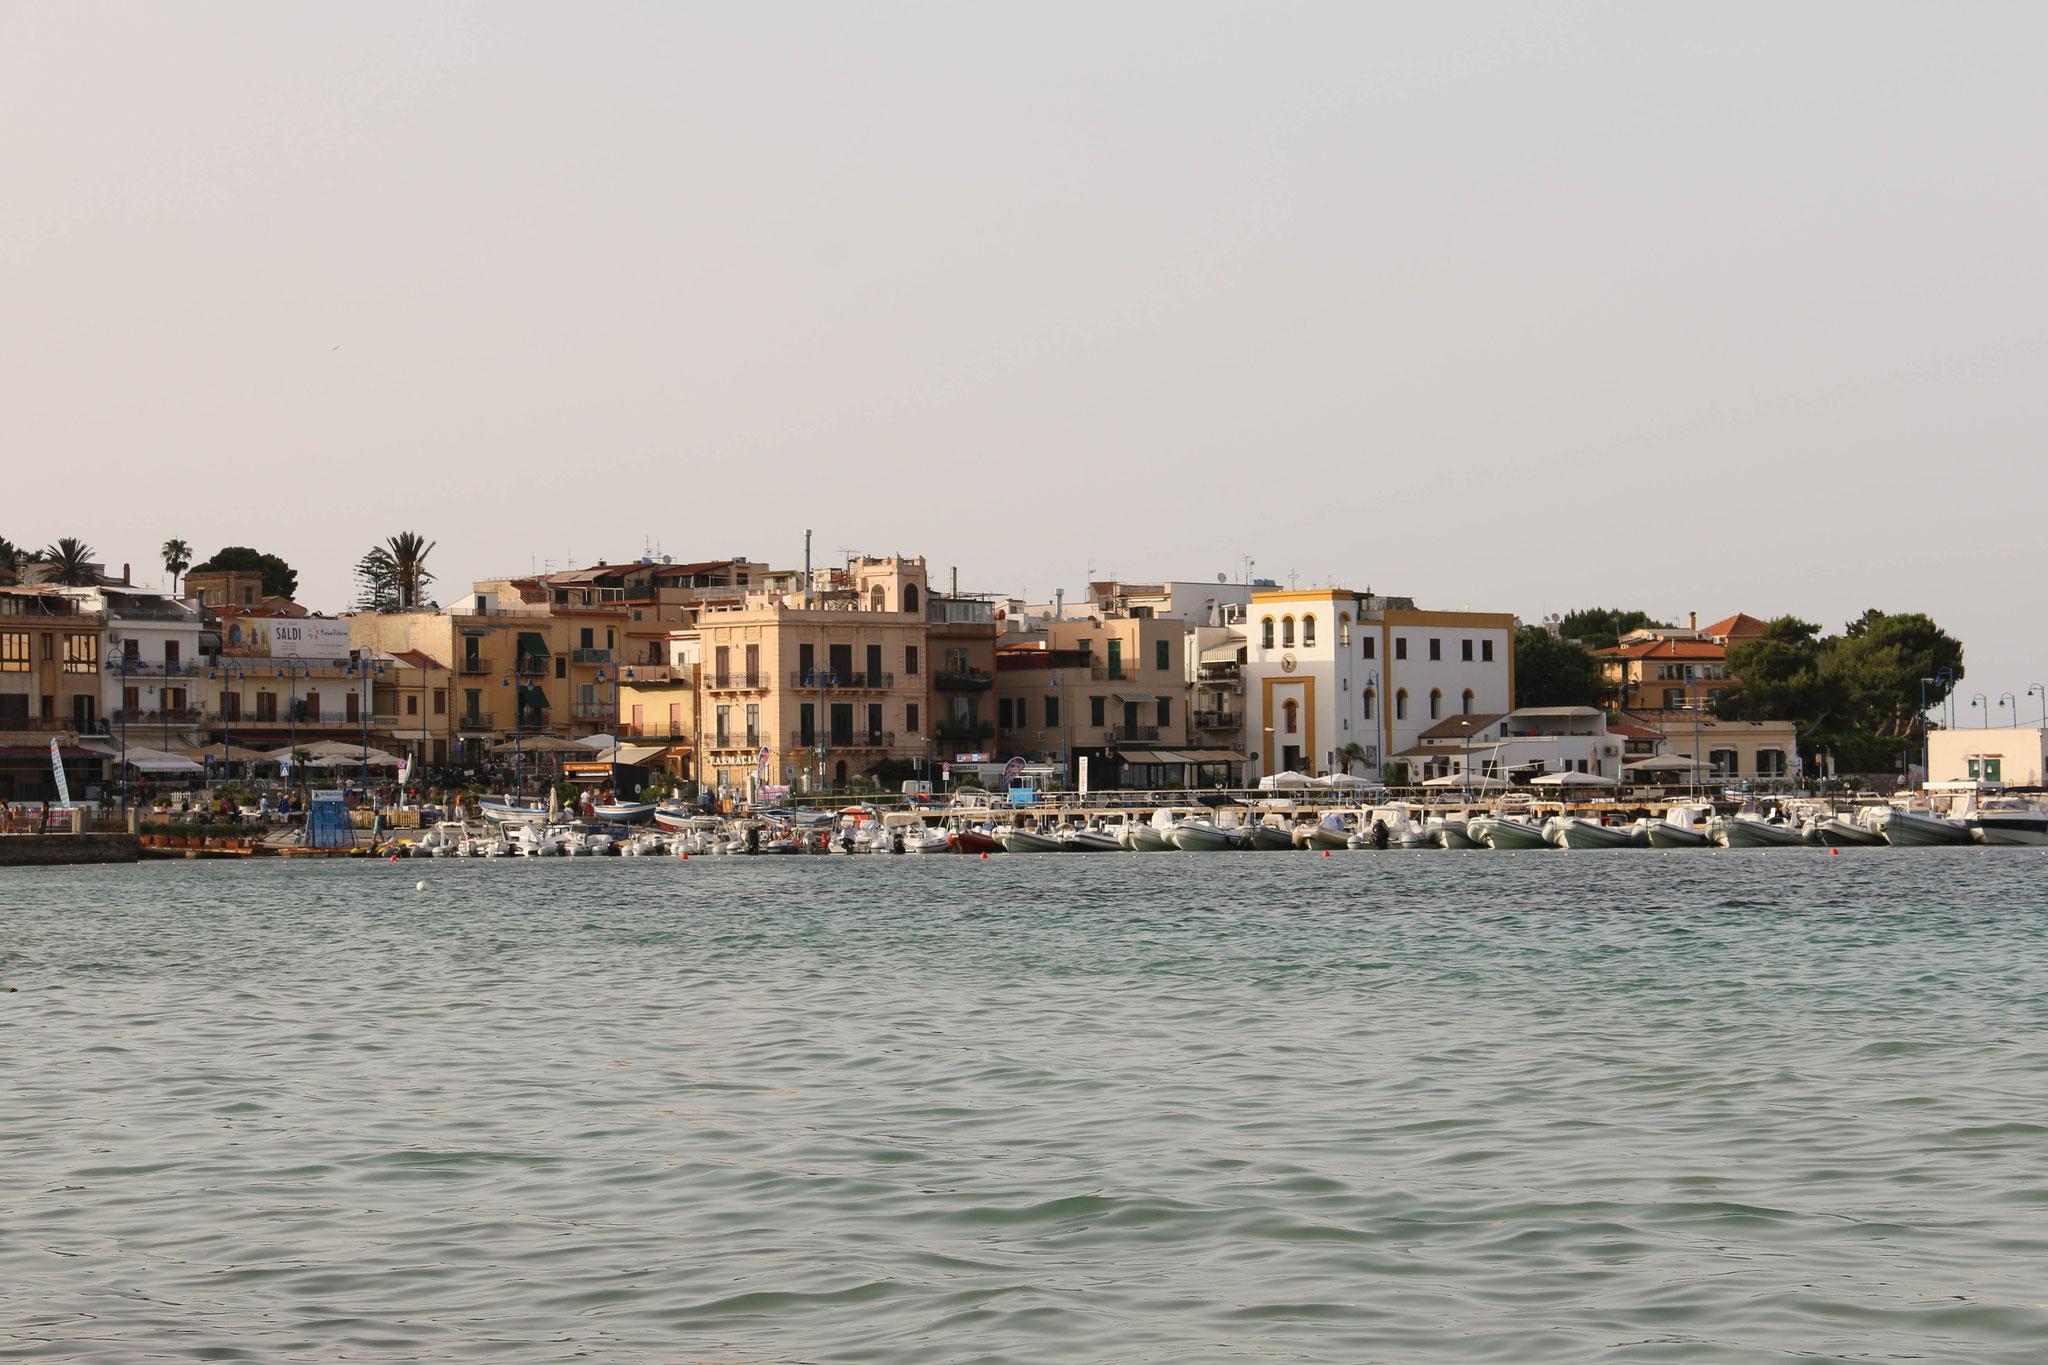 Sizilien, Sicilia, Mondello, Italy, Carmen Schubert